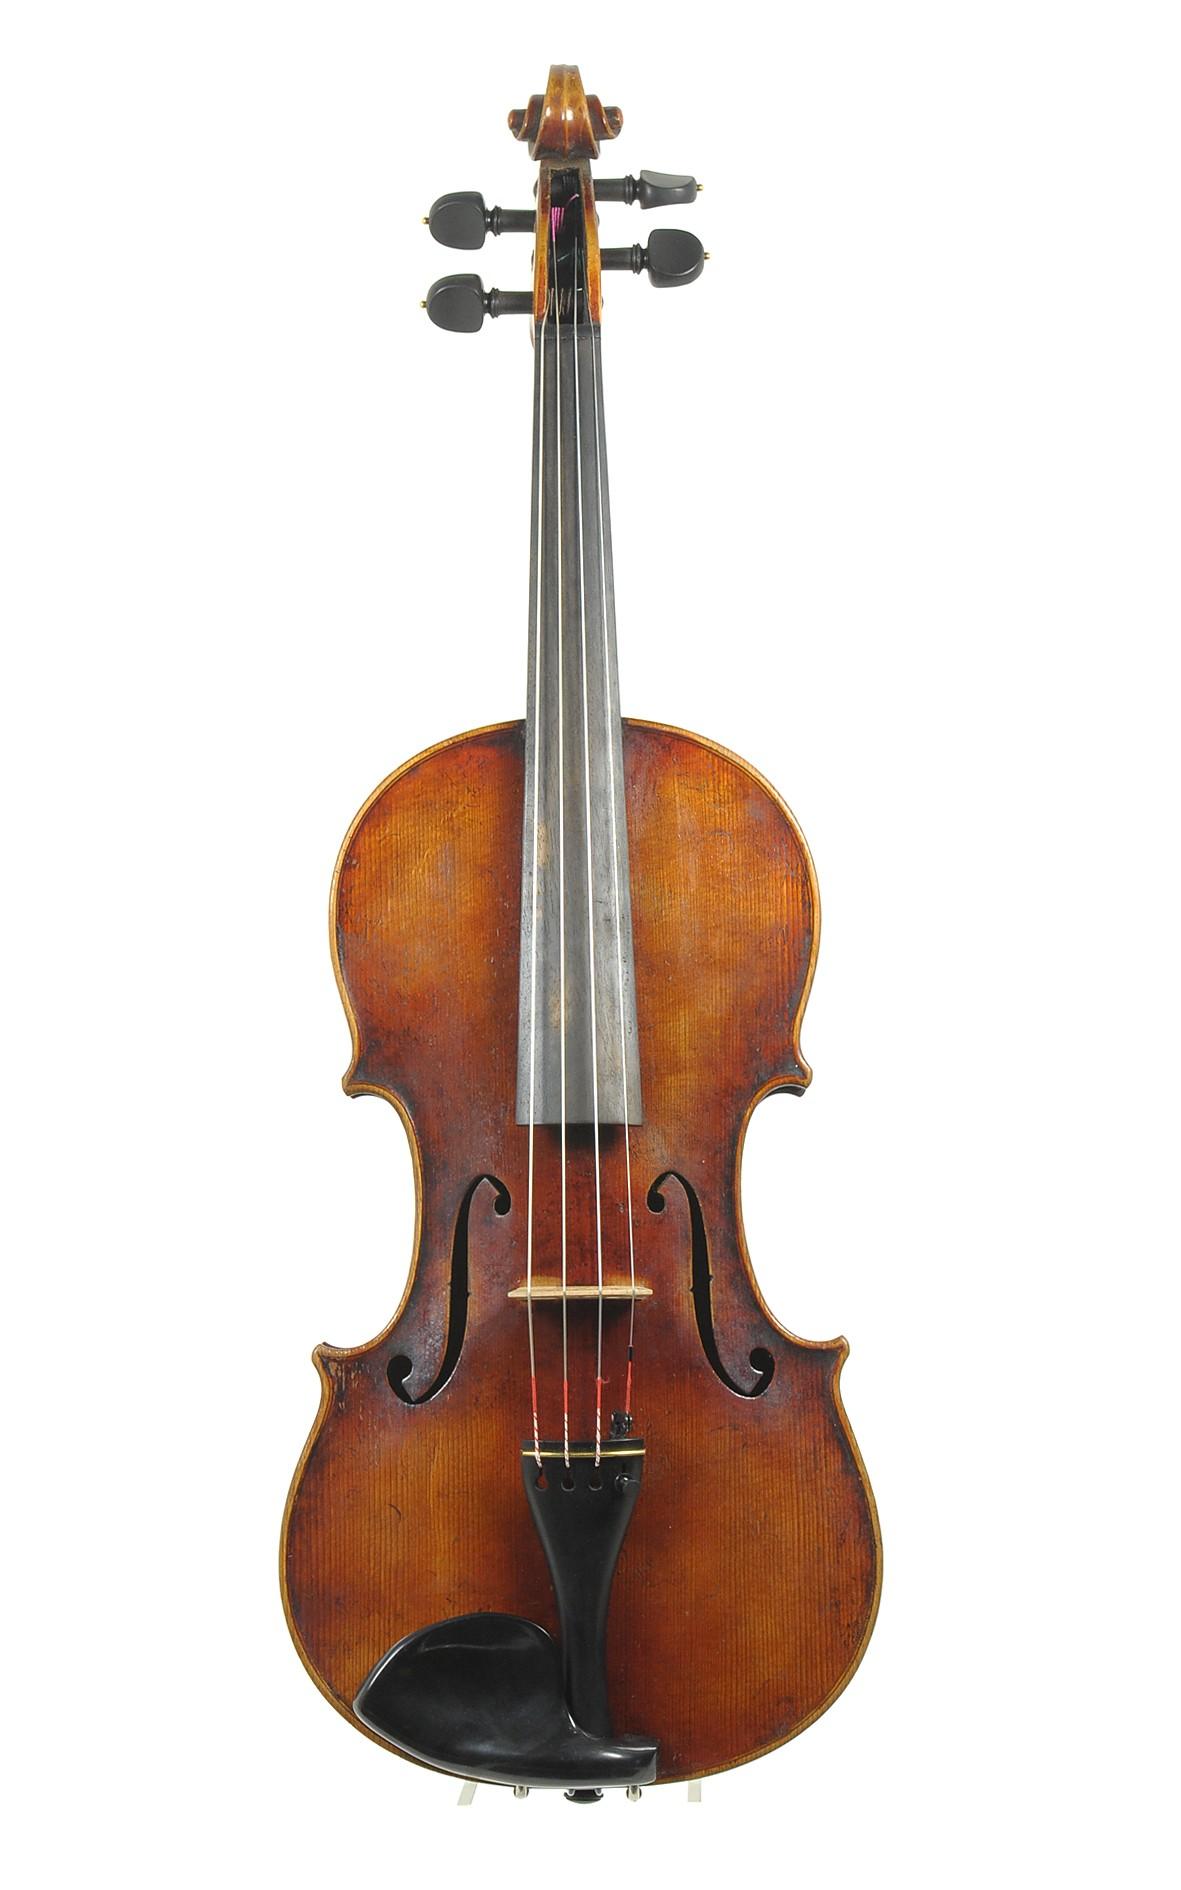 German violin after Guarneri, Markneukirchen ca. 1900 - top